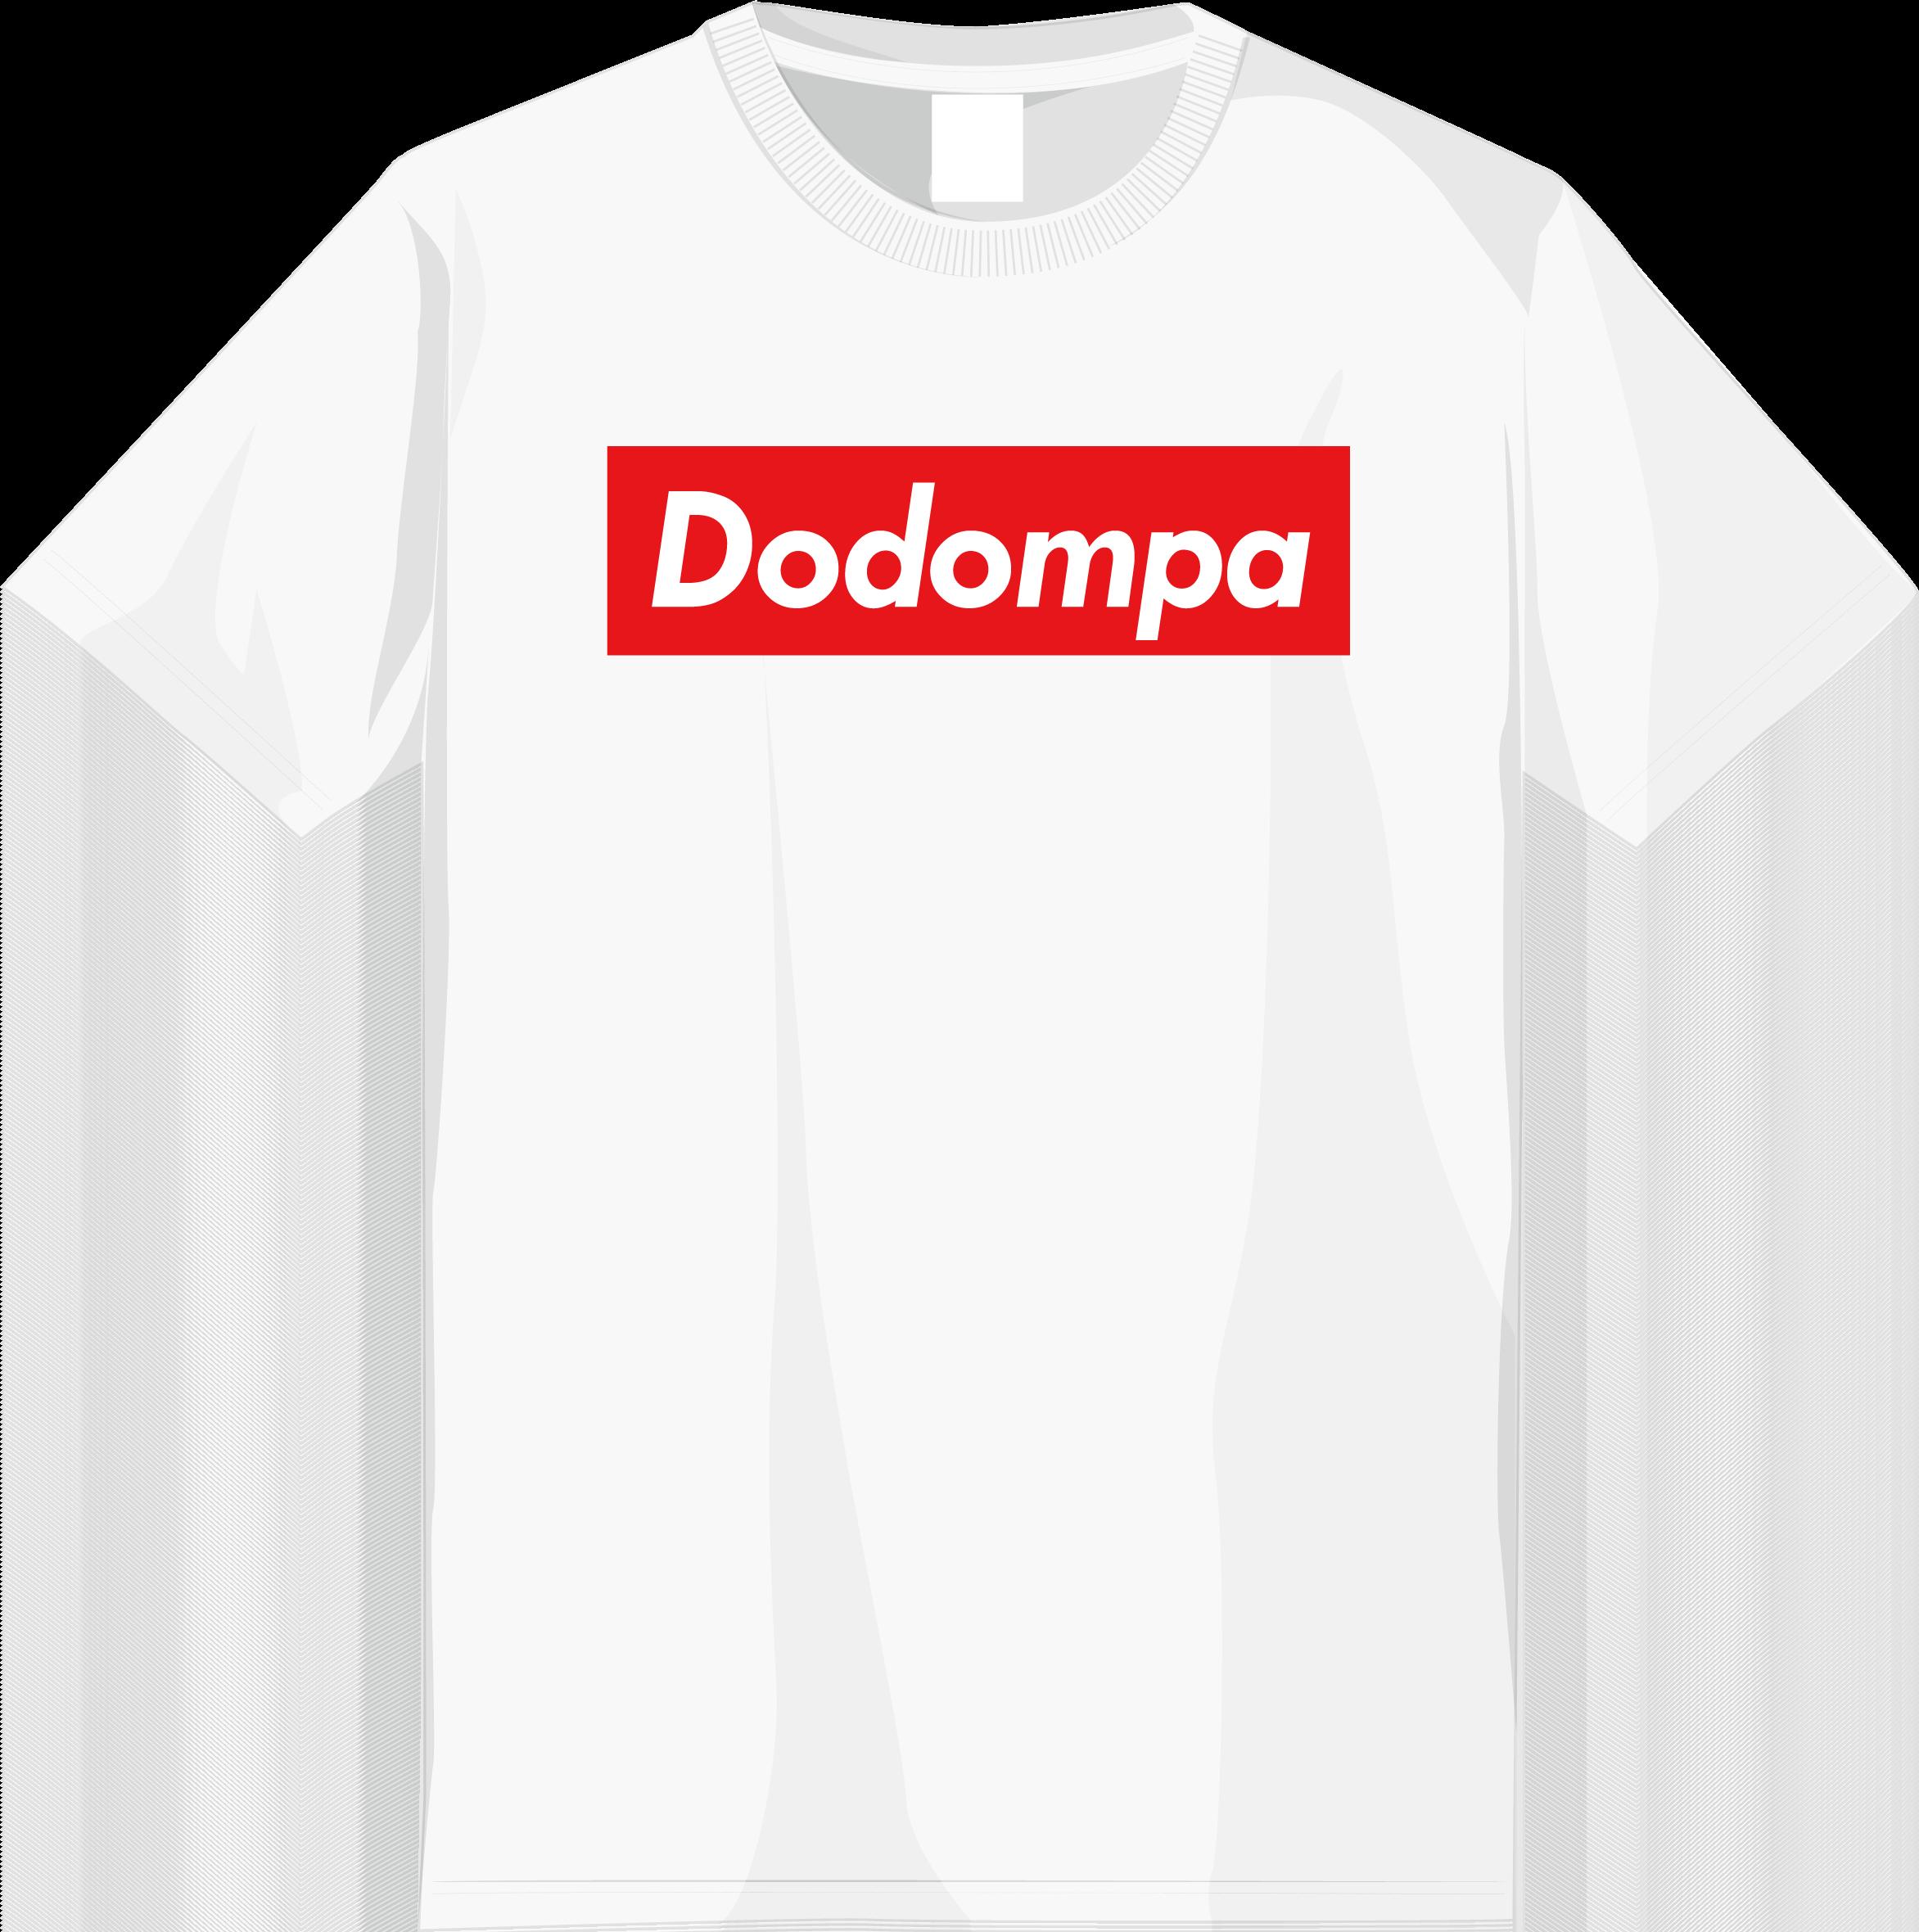 dodompa_front-tshirt_white